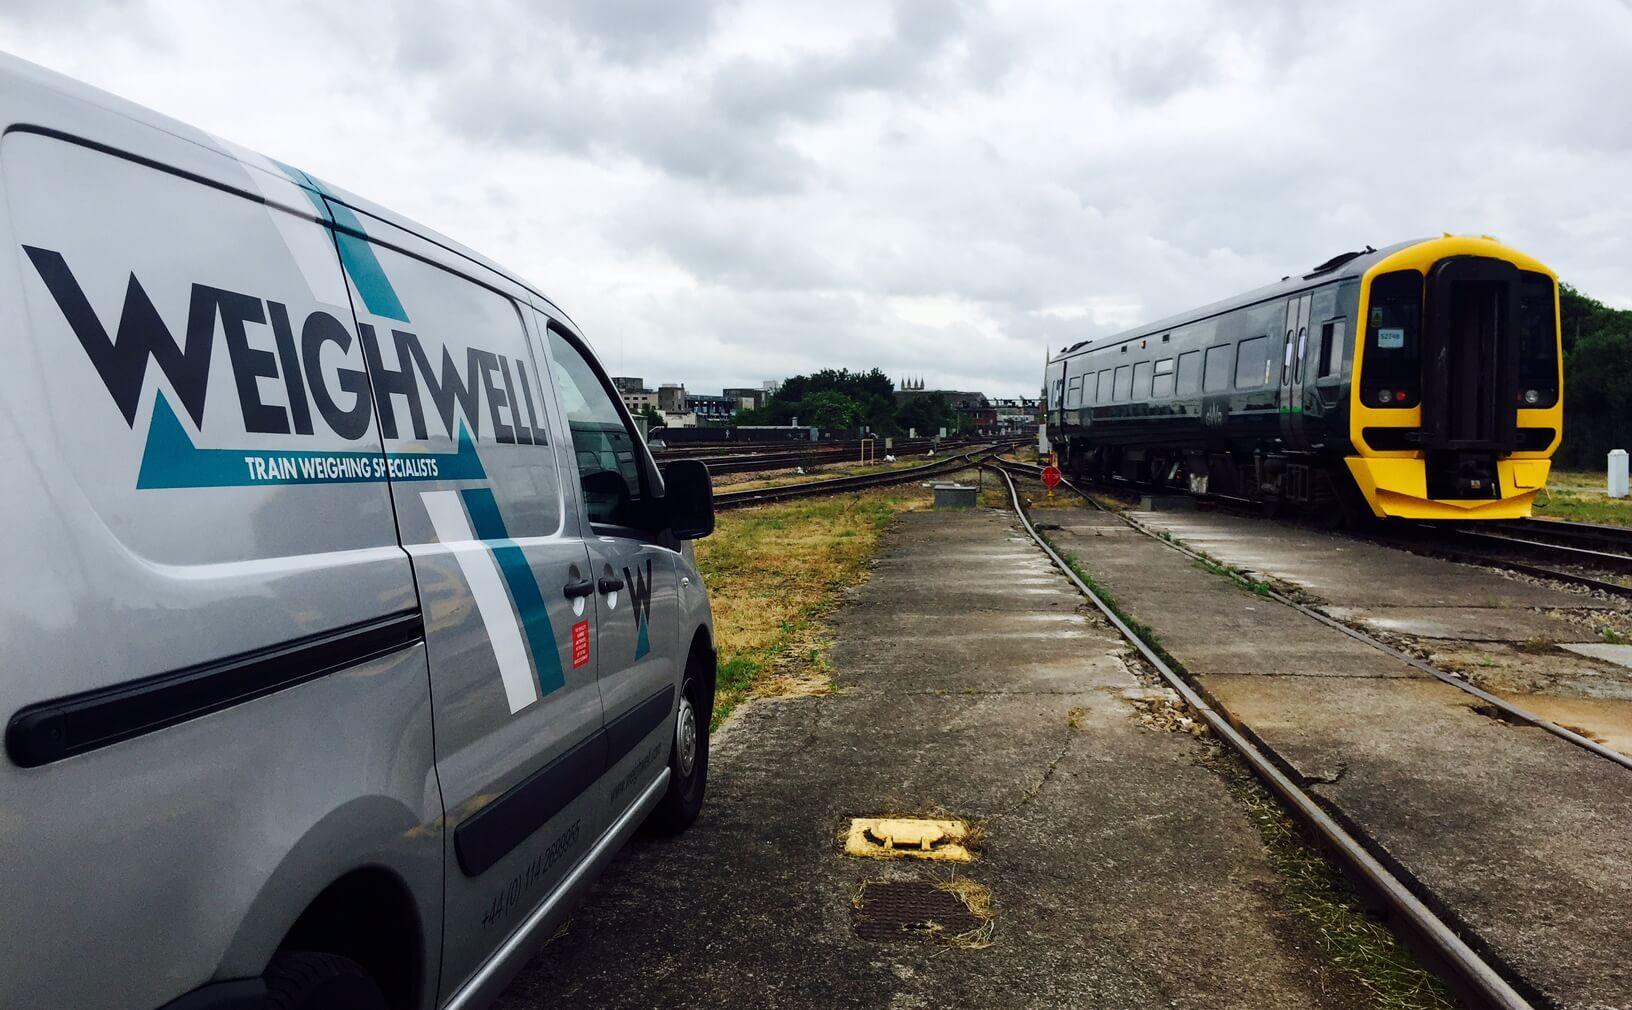 Weighwell at Arriva Traincare